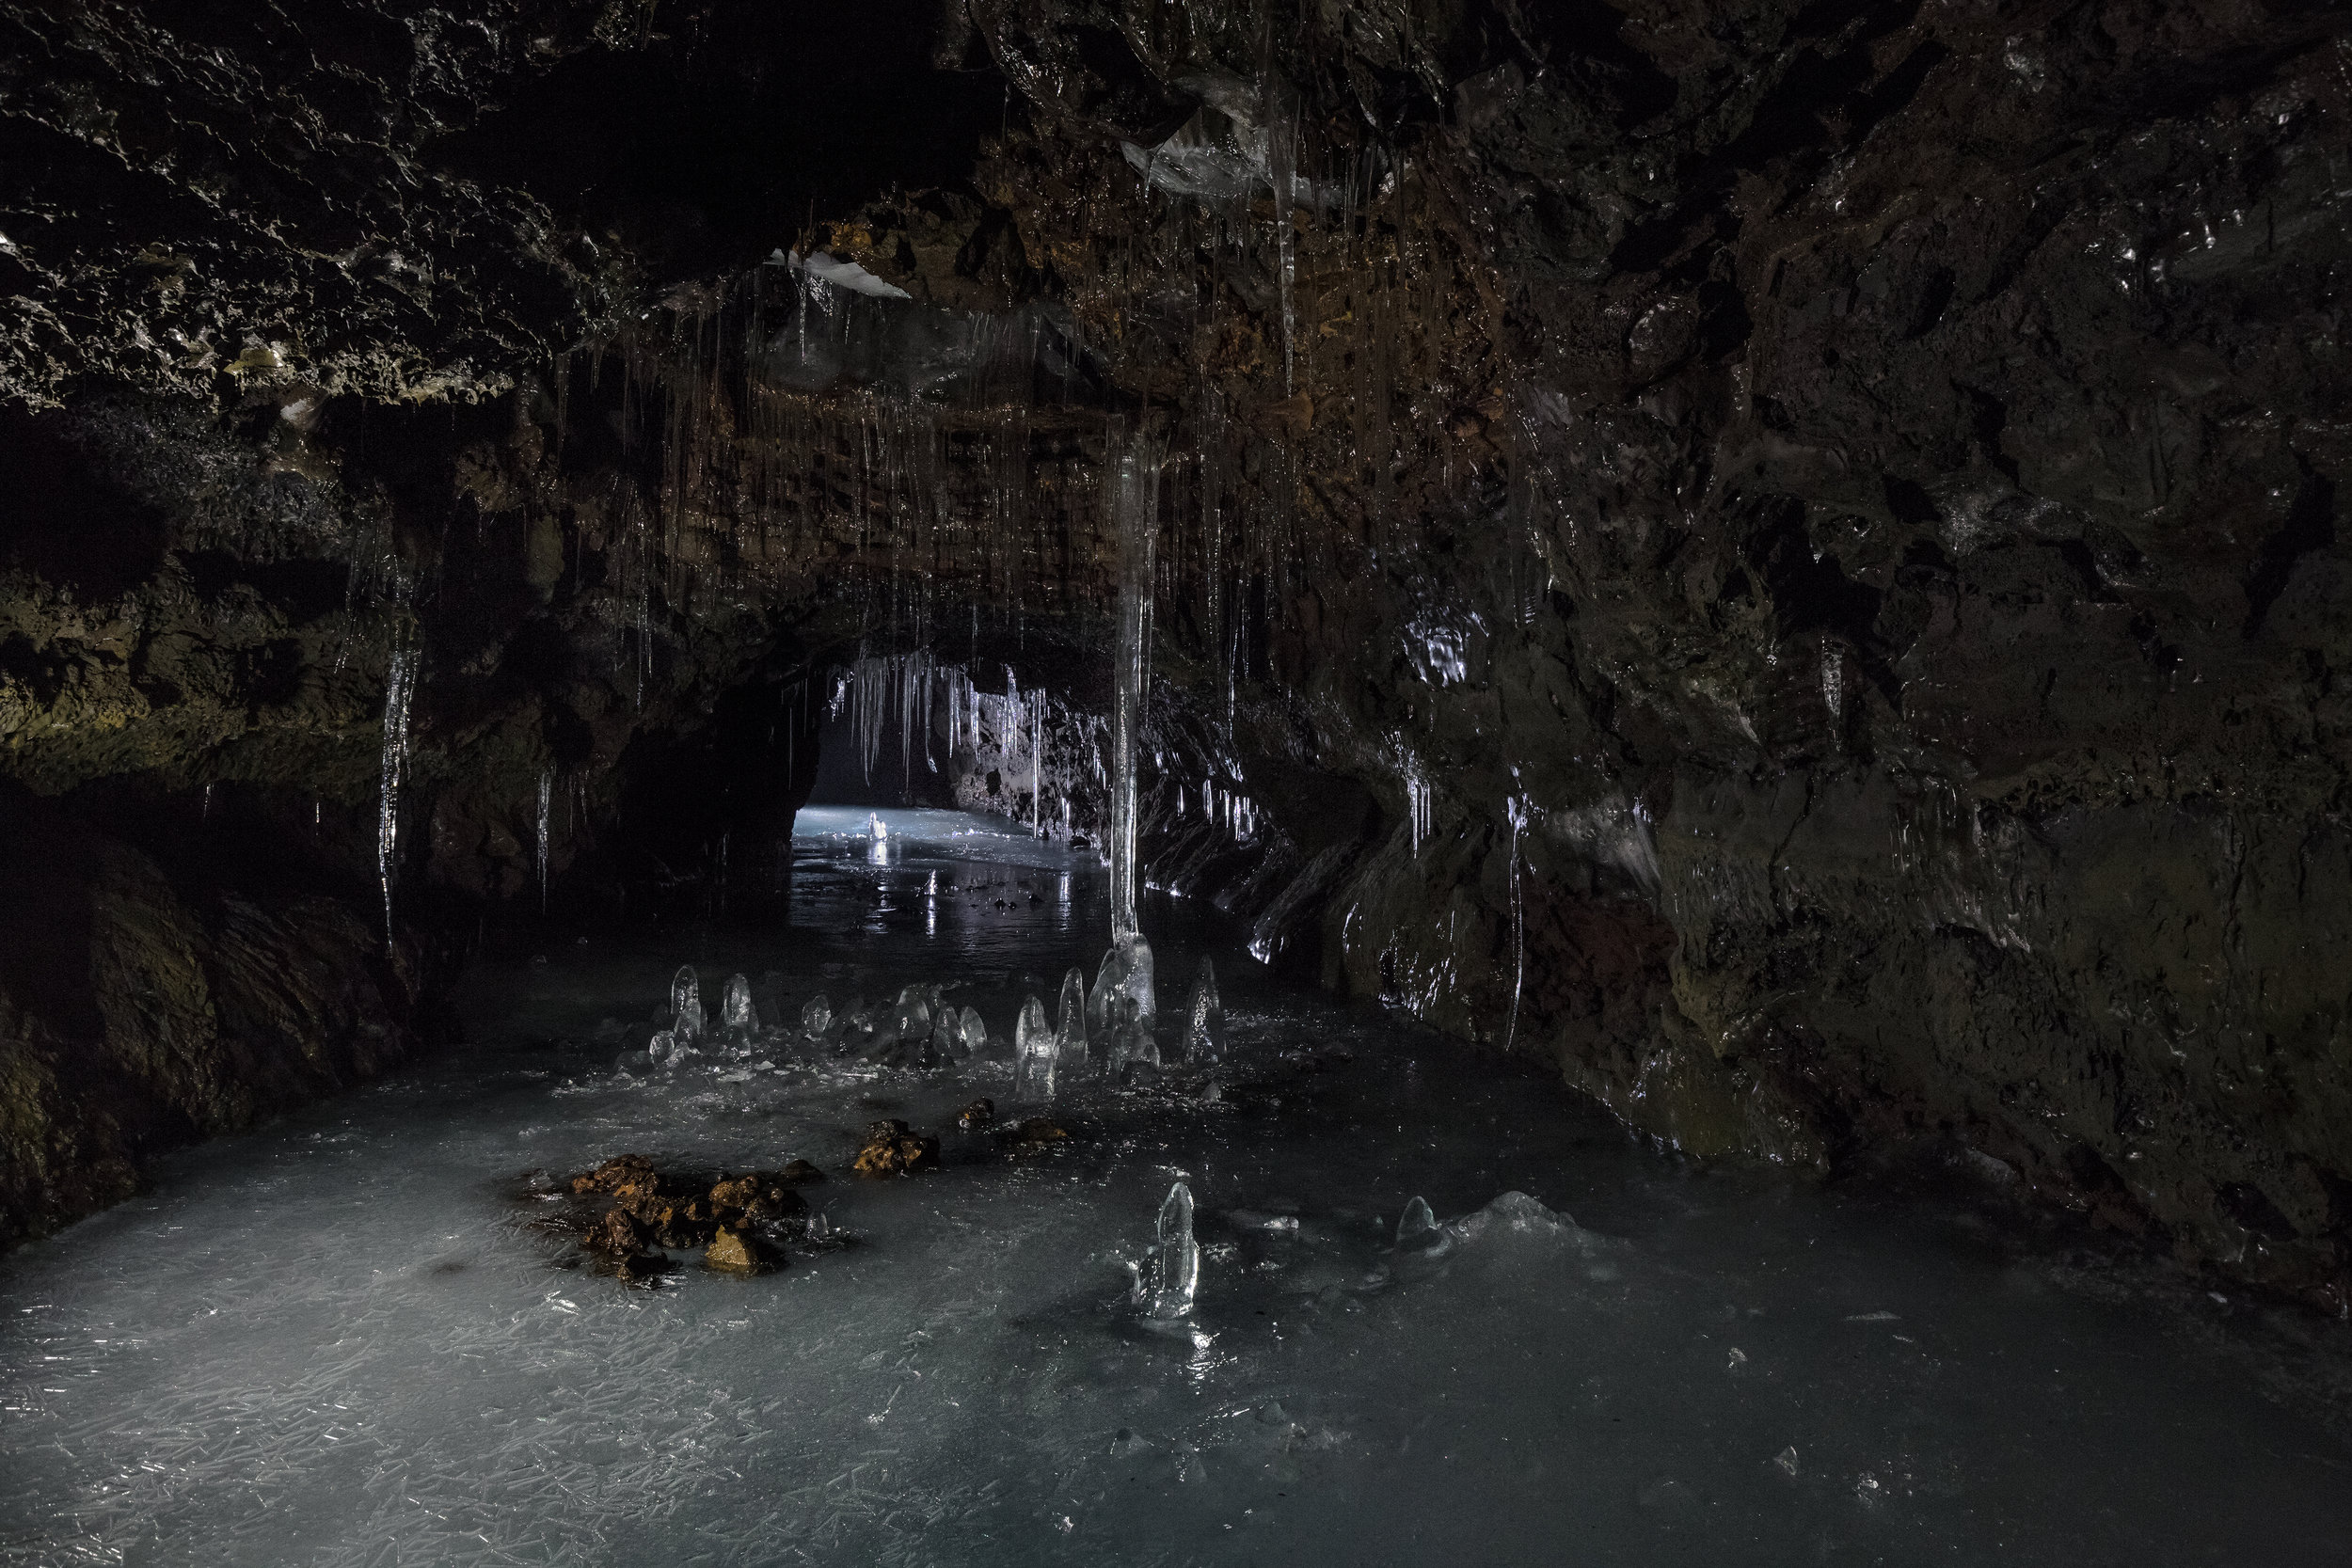 deep-ice-cave-no-person_MG_9865-1-copy.jpg